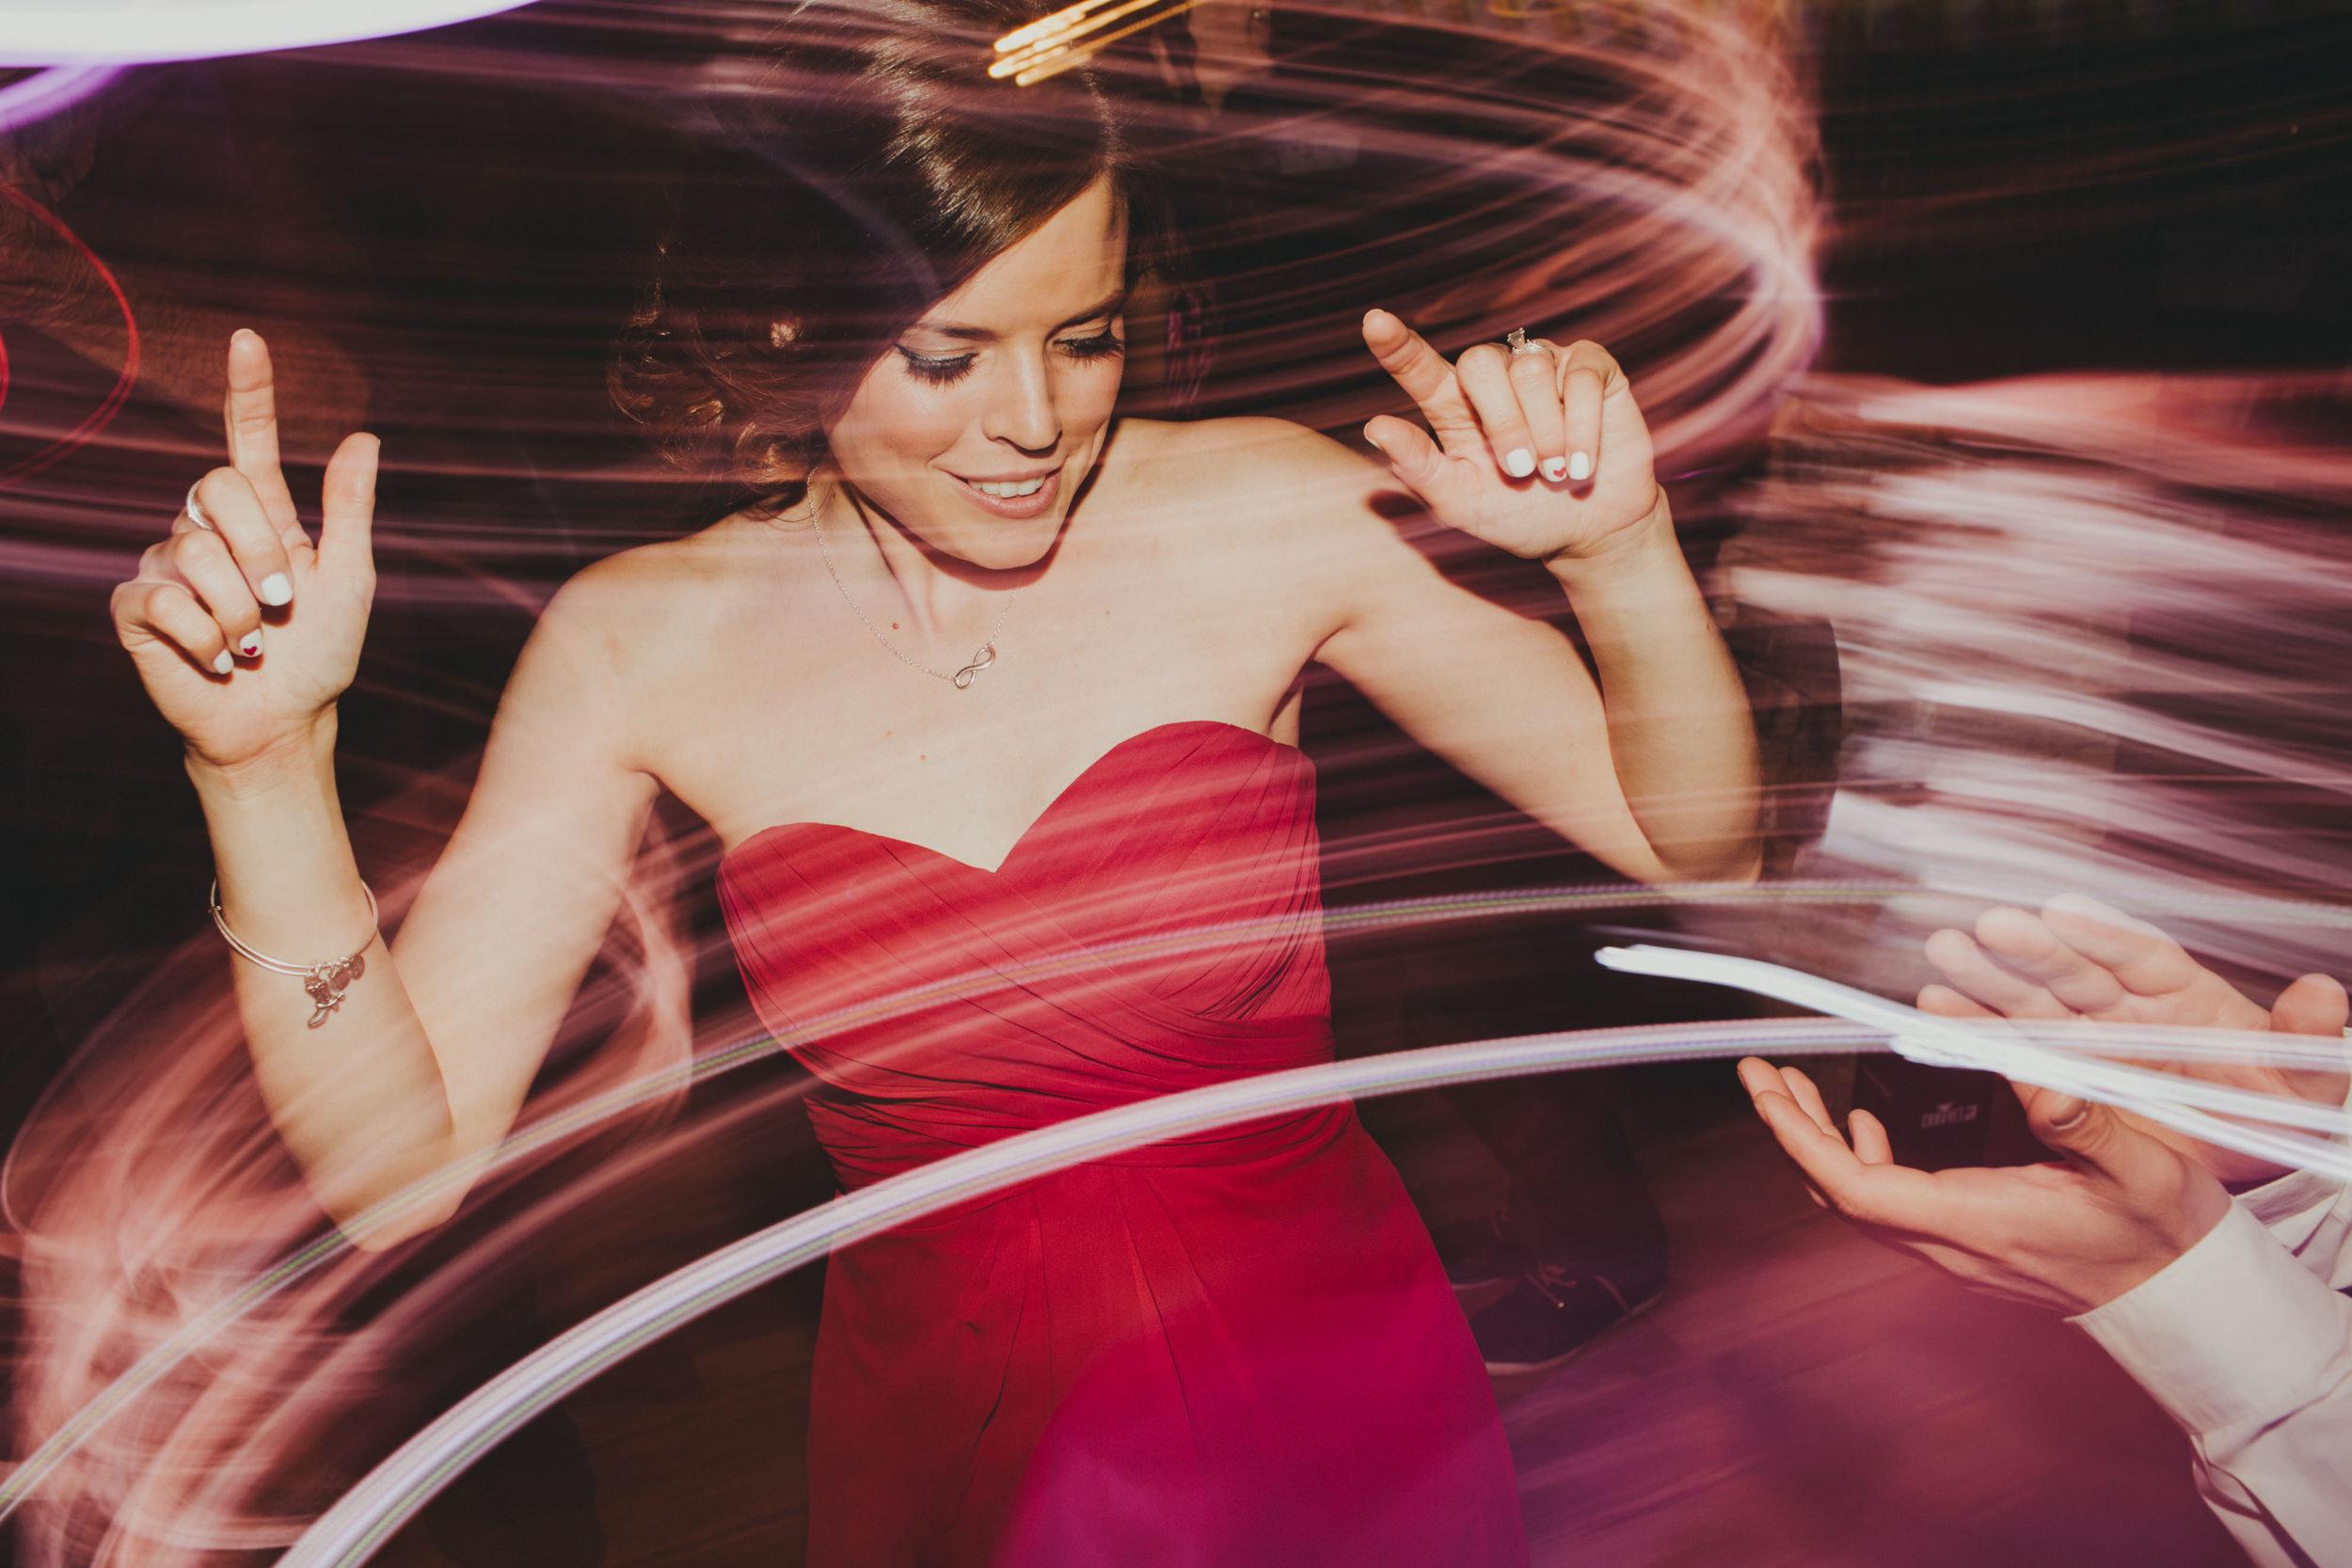 Cheyenne + Jordan - Wedding, Natalie Griffo (142 of 157).jpg